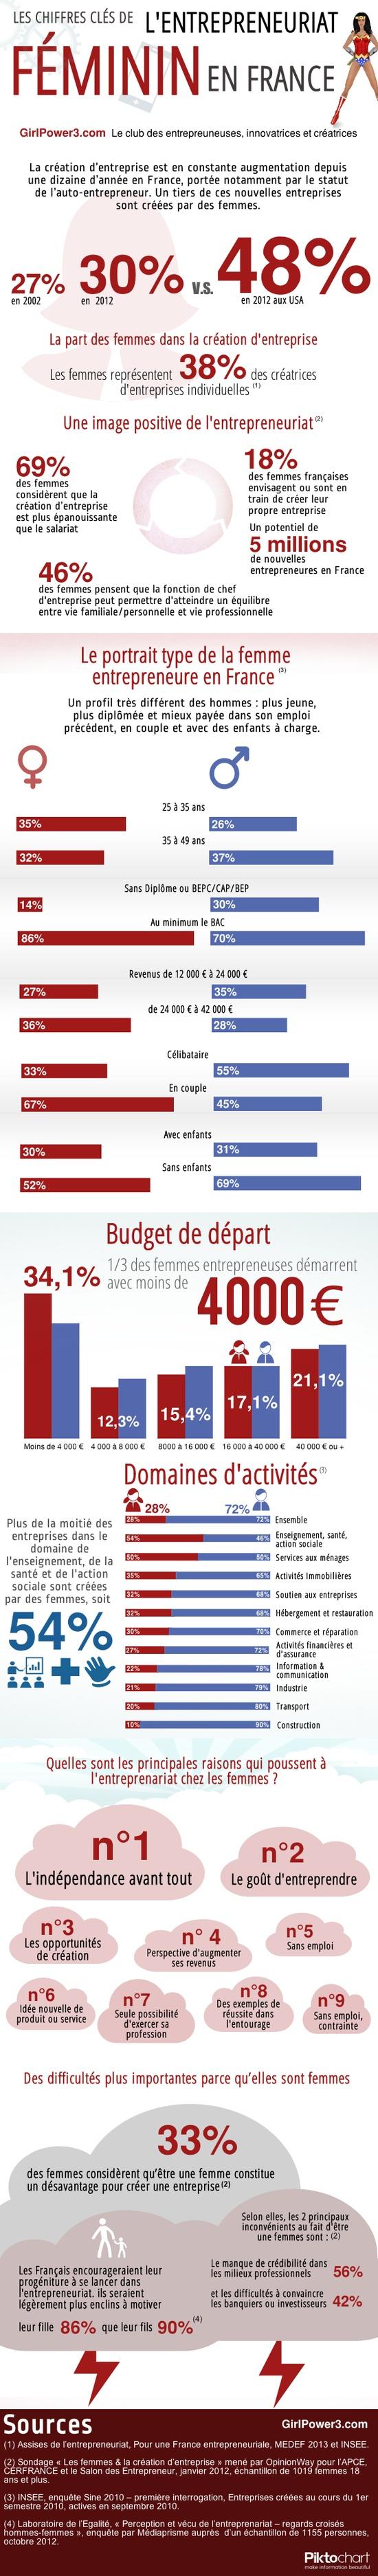 infographie femme entreprise